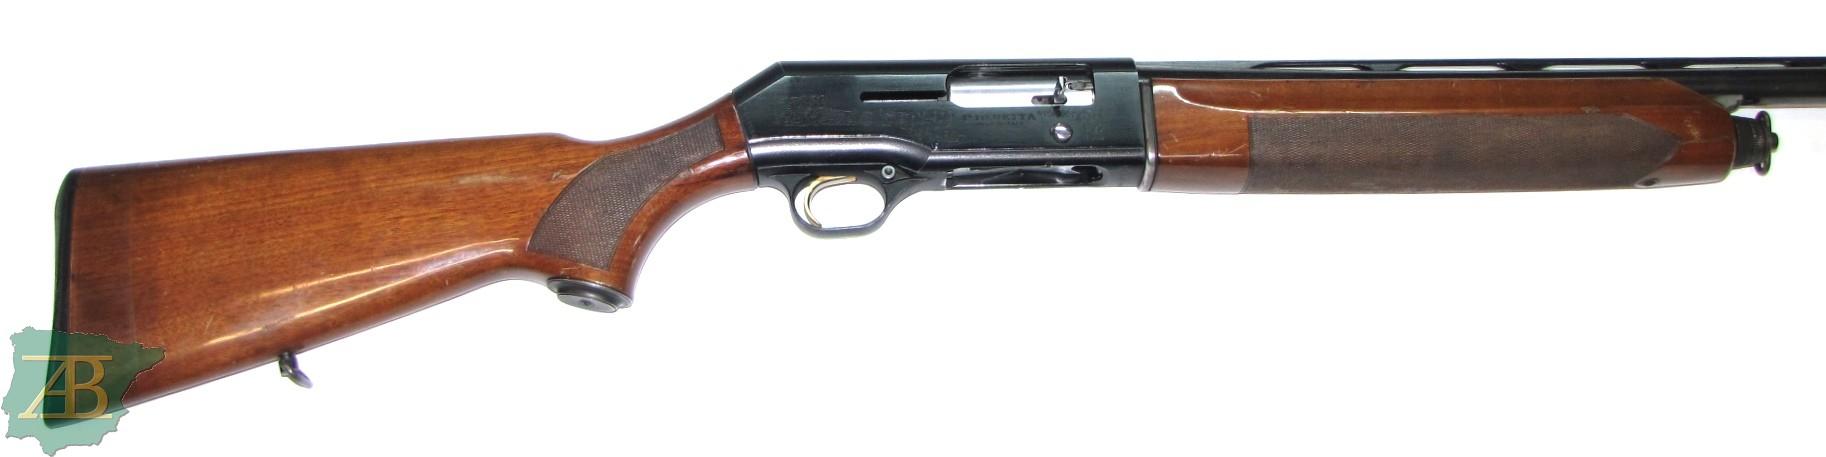 Escopeta semiautomática de caza BERETTA A304 SILVER LARK Ref 5744-armeriaiberica-2